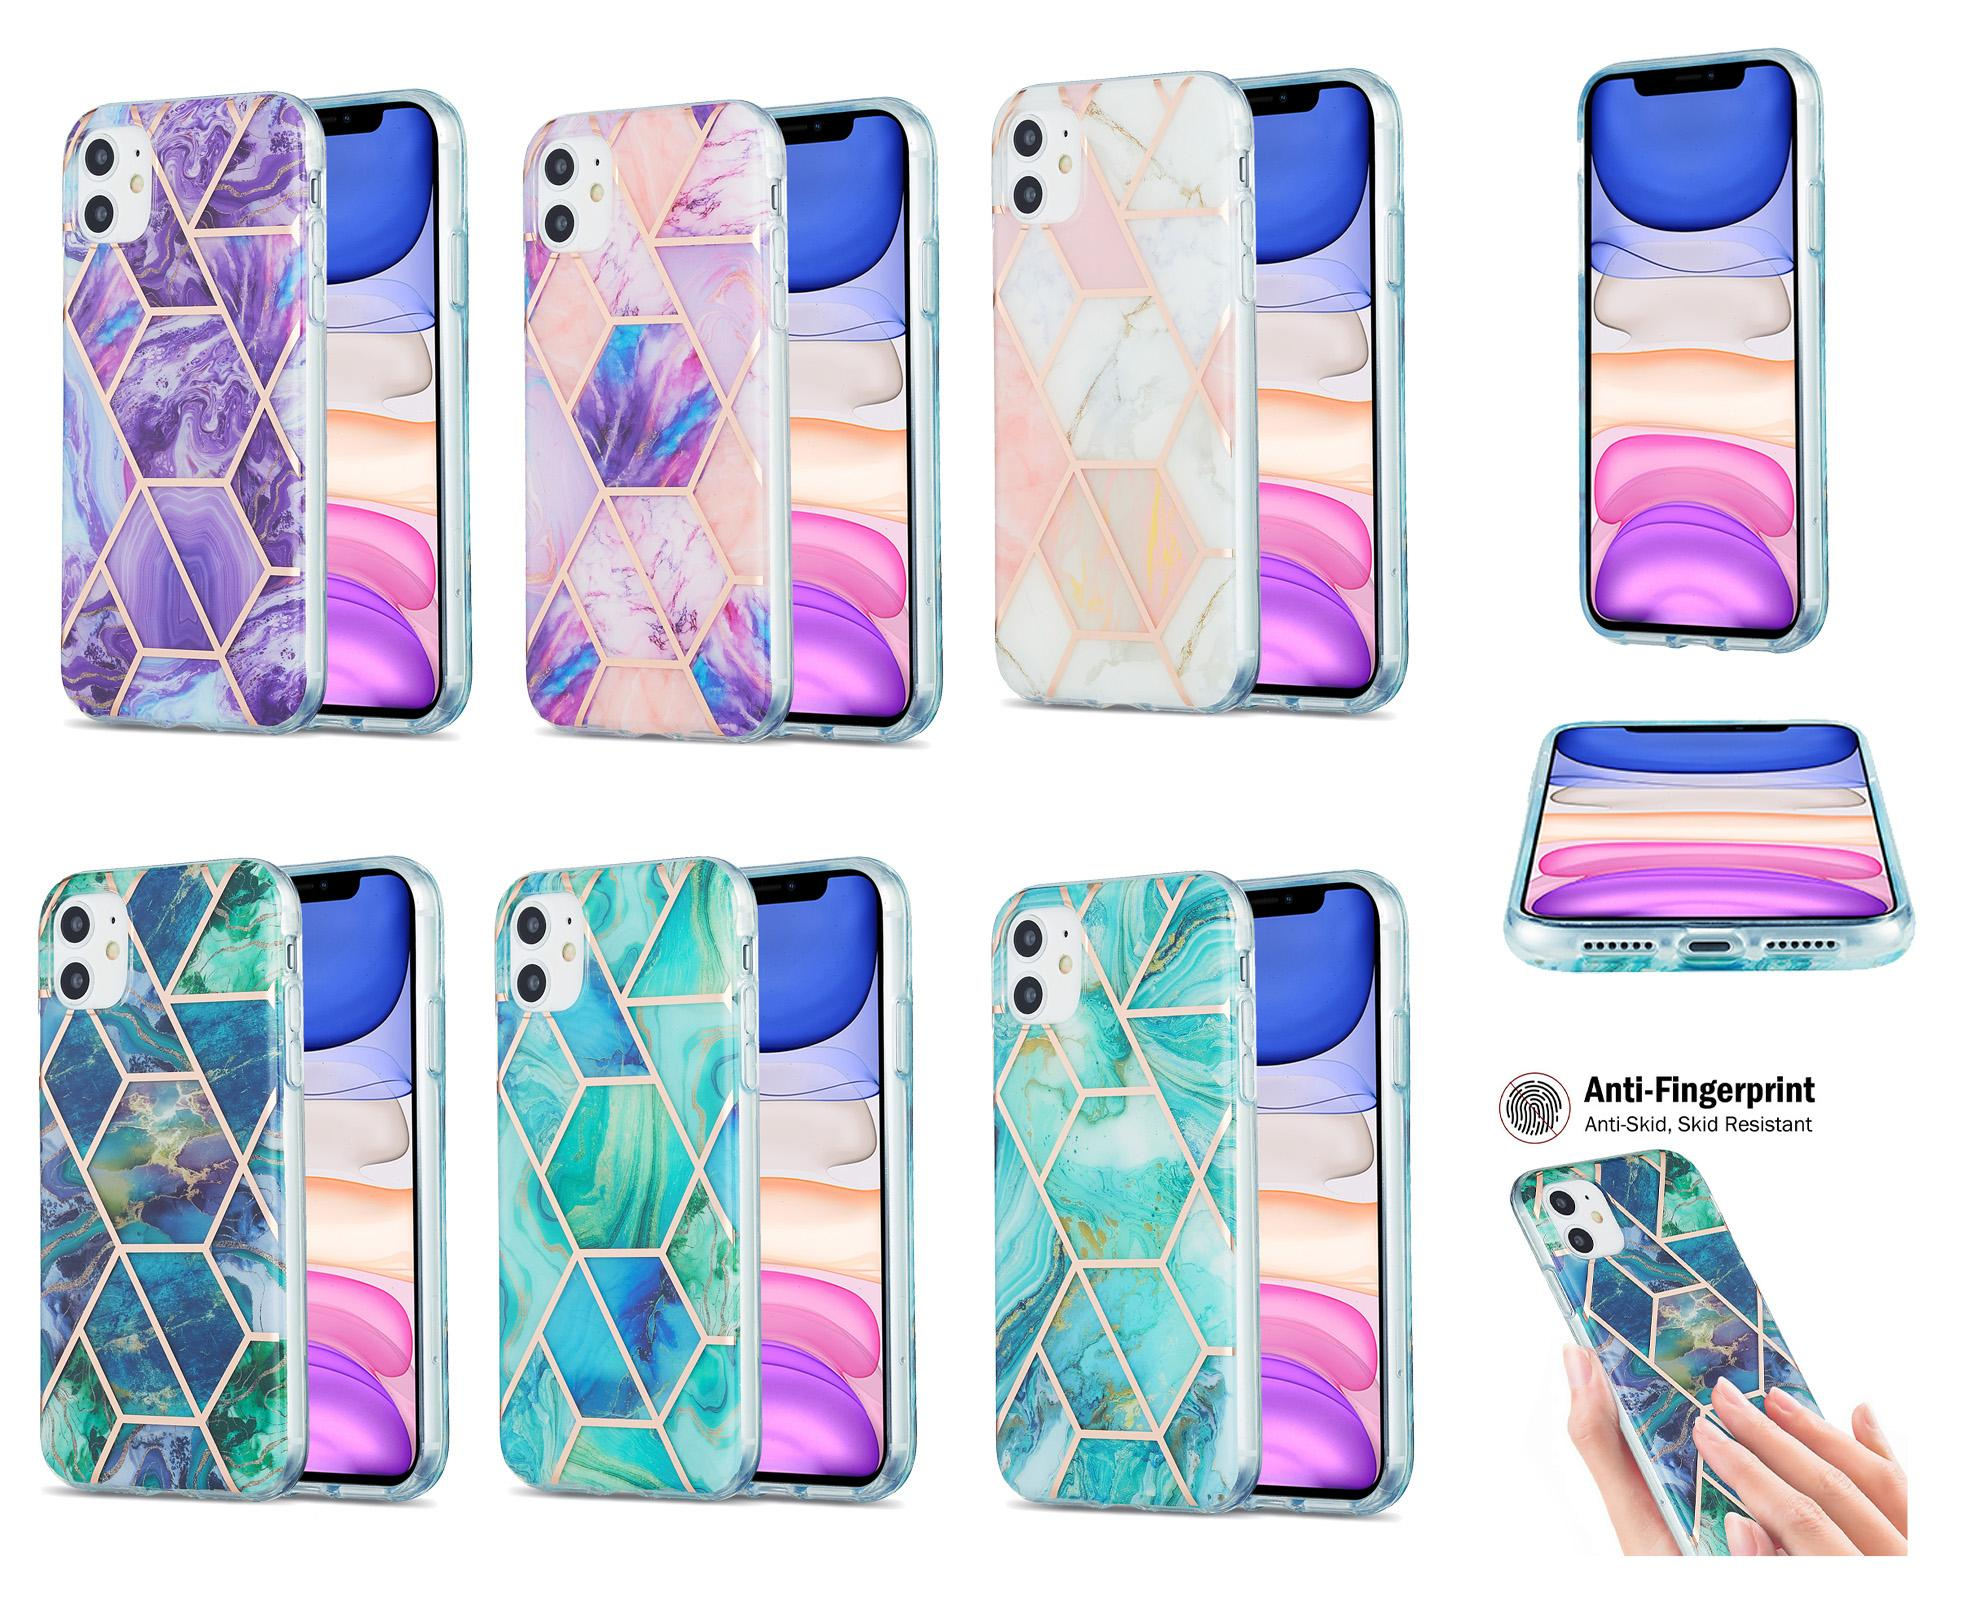 Caso de telefone geométrico galvanoplado para iphone 7 8 7 mais 8 mais x xr xs max 11 pro max 12 pro max mármore tampa macia tampa coque